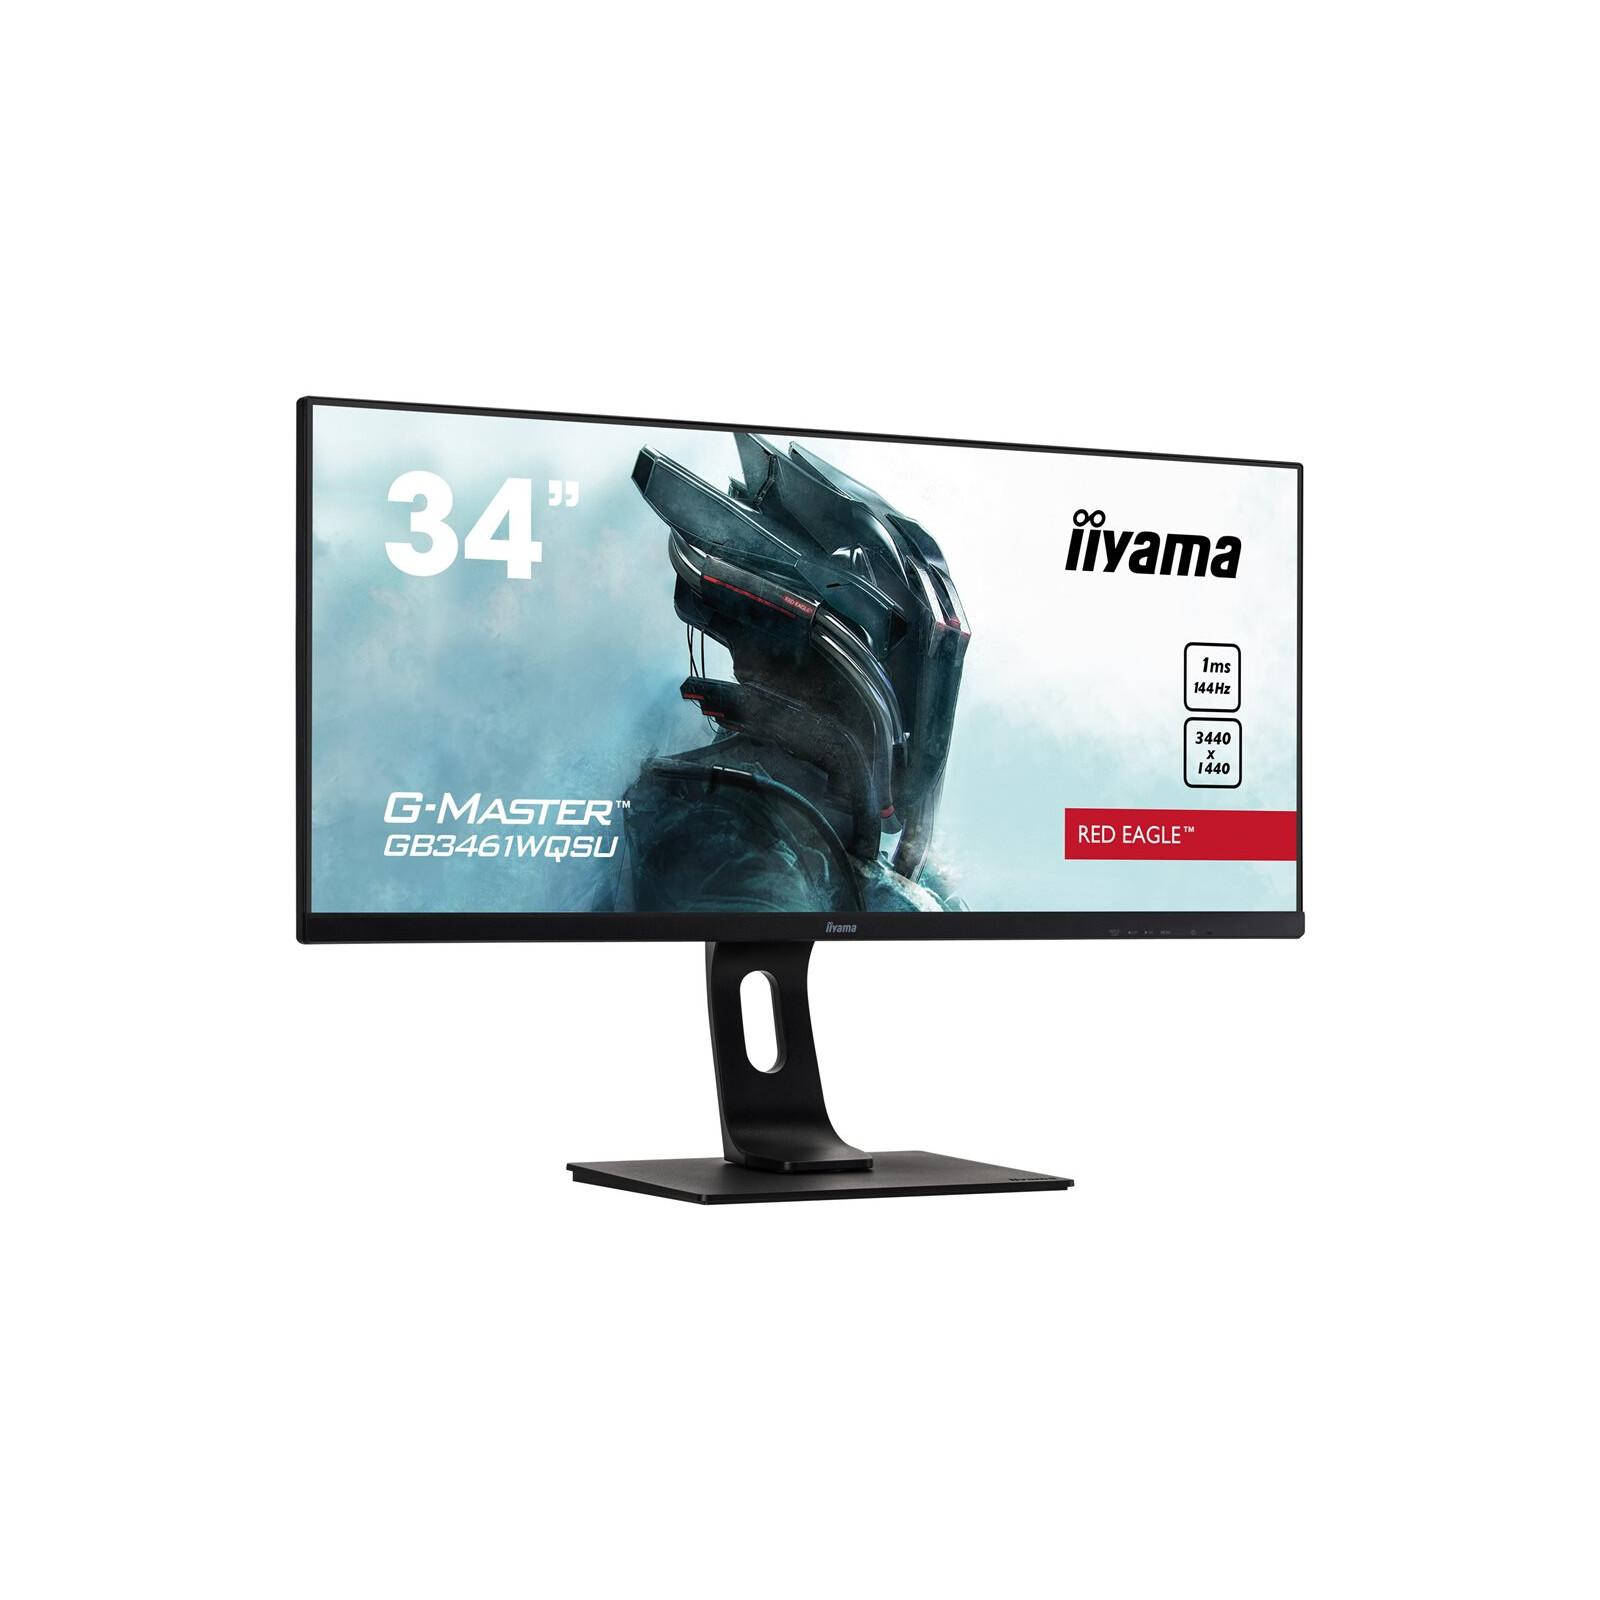 IIYAMA G-Master GB3461WQSU-B1 Red Eagle 34 Zoll Monitor